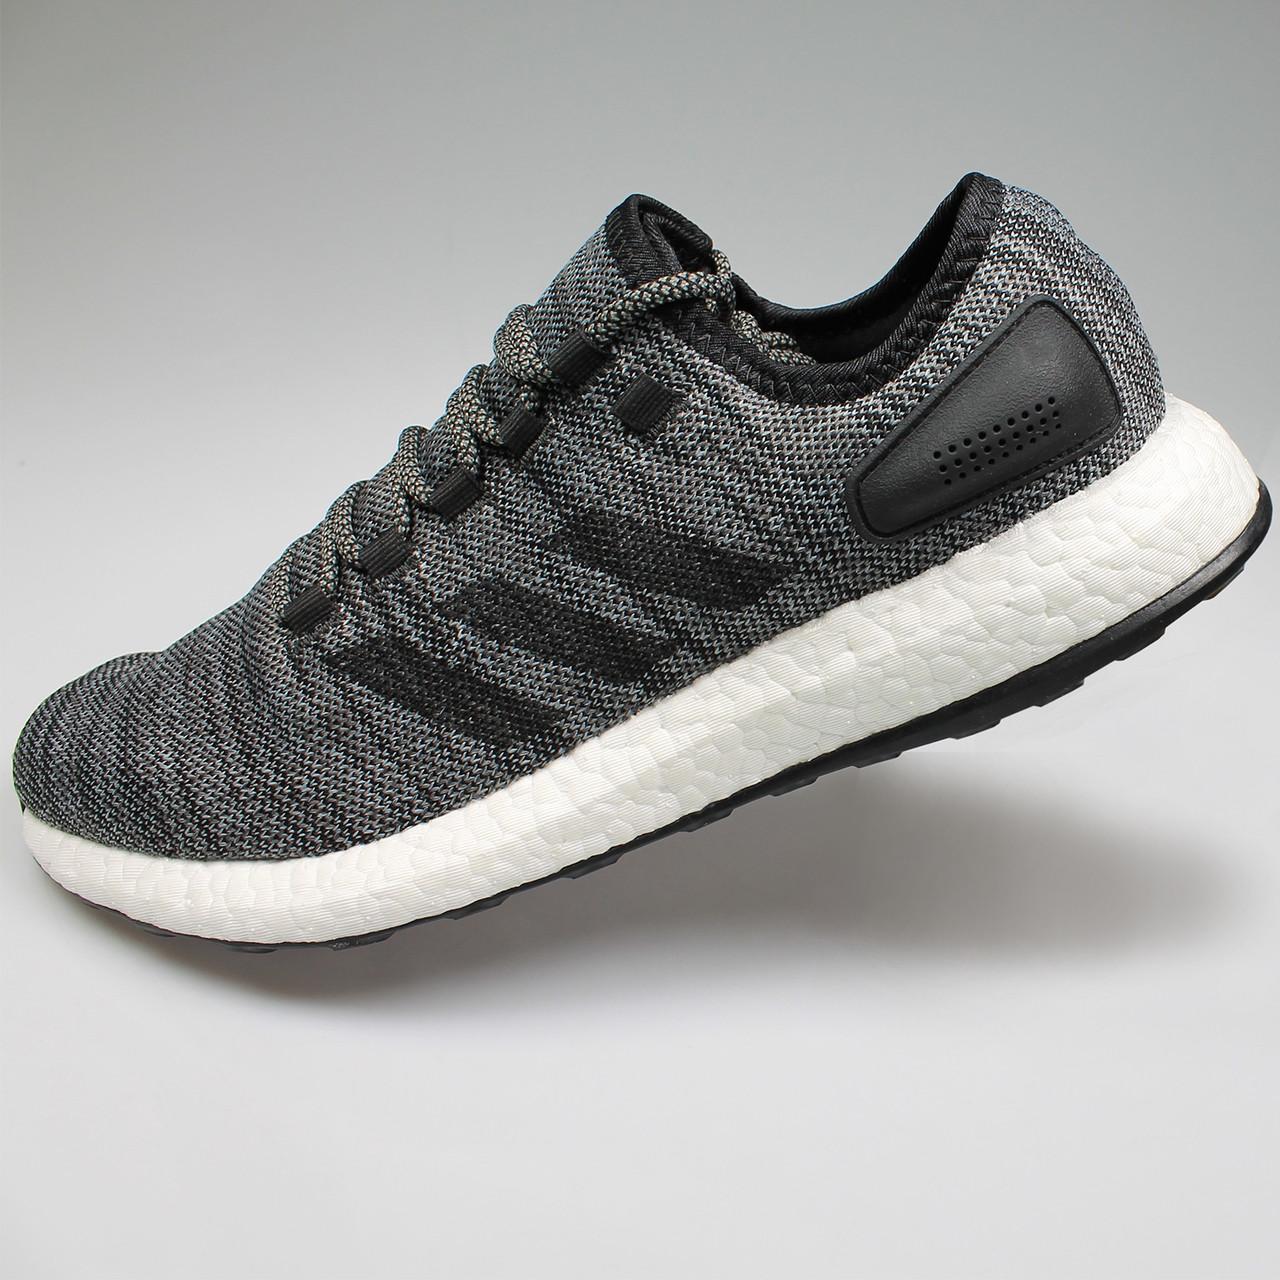 19d7fa4ada625 ... Adidas PureBOOST All Terrain Mens Sneakers S80787 - Grey